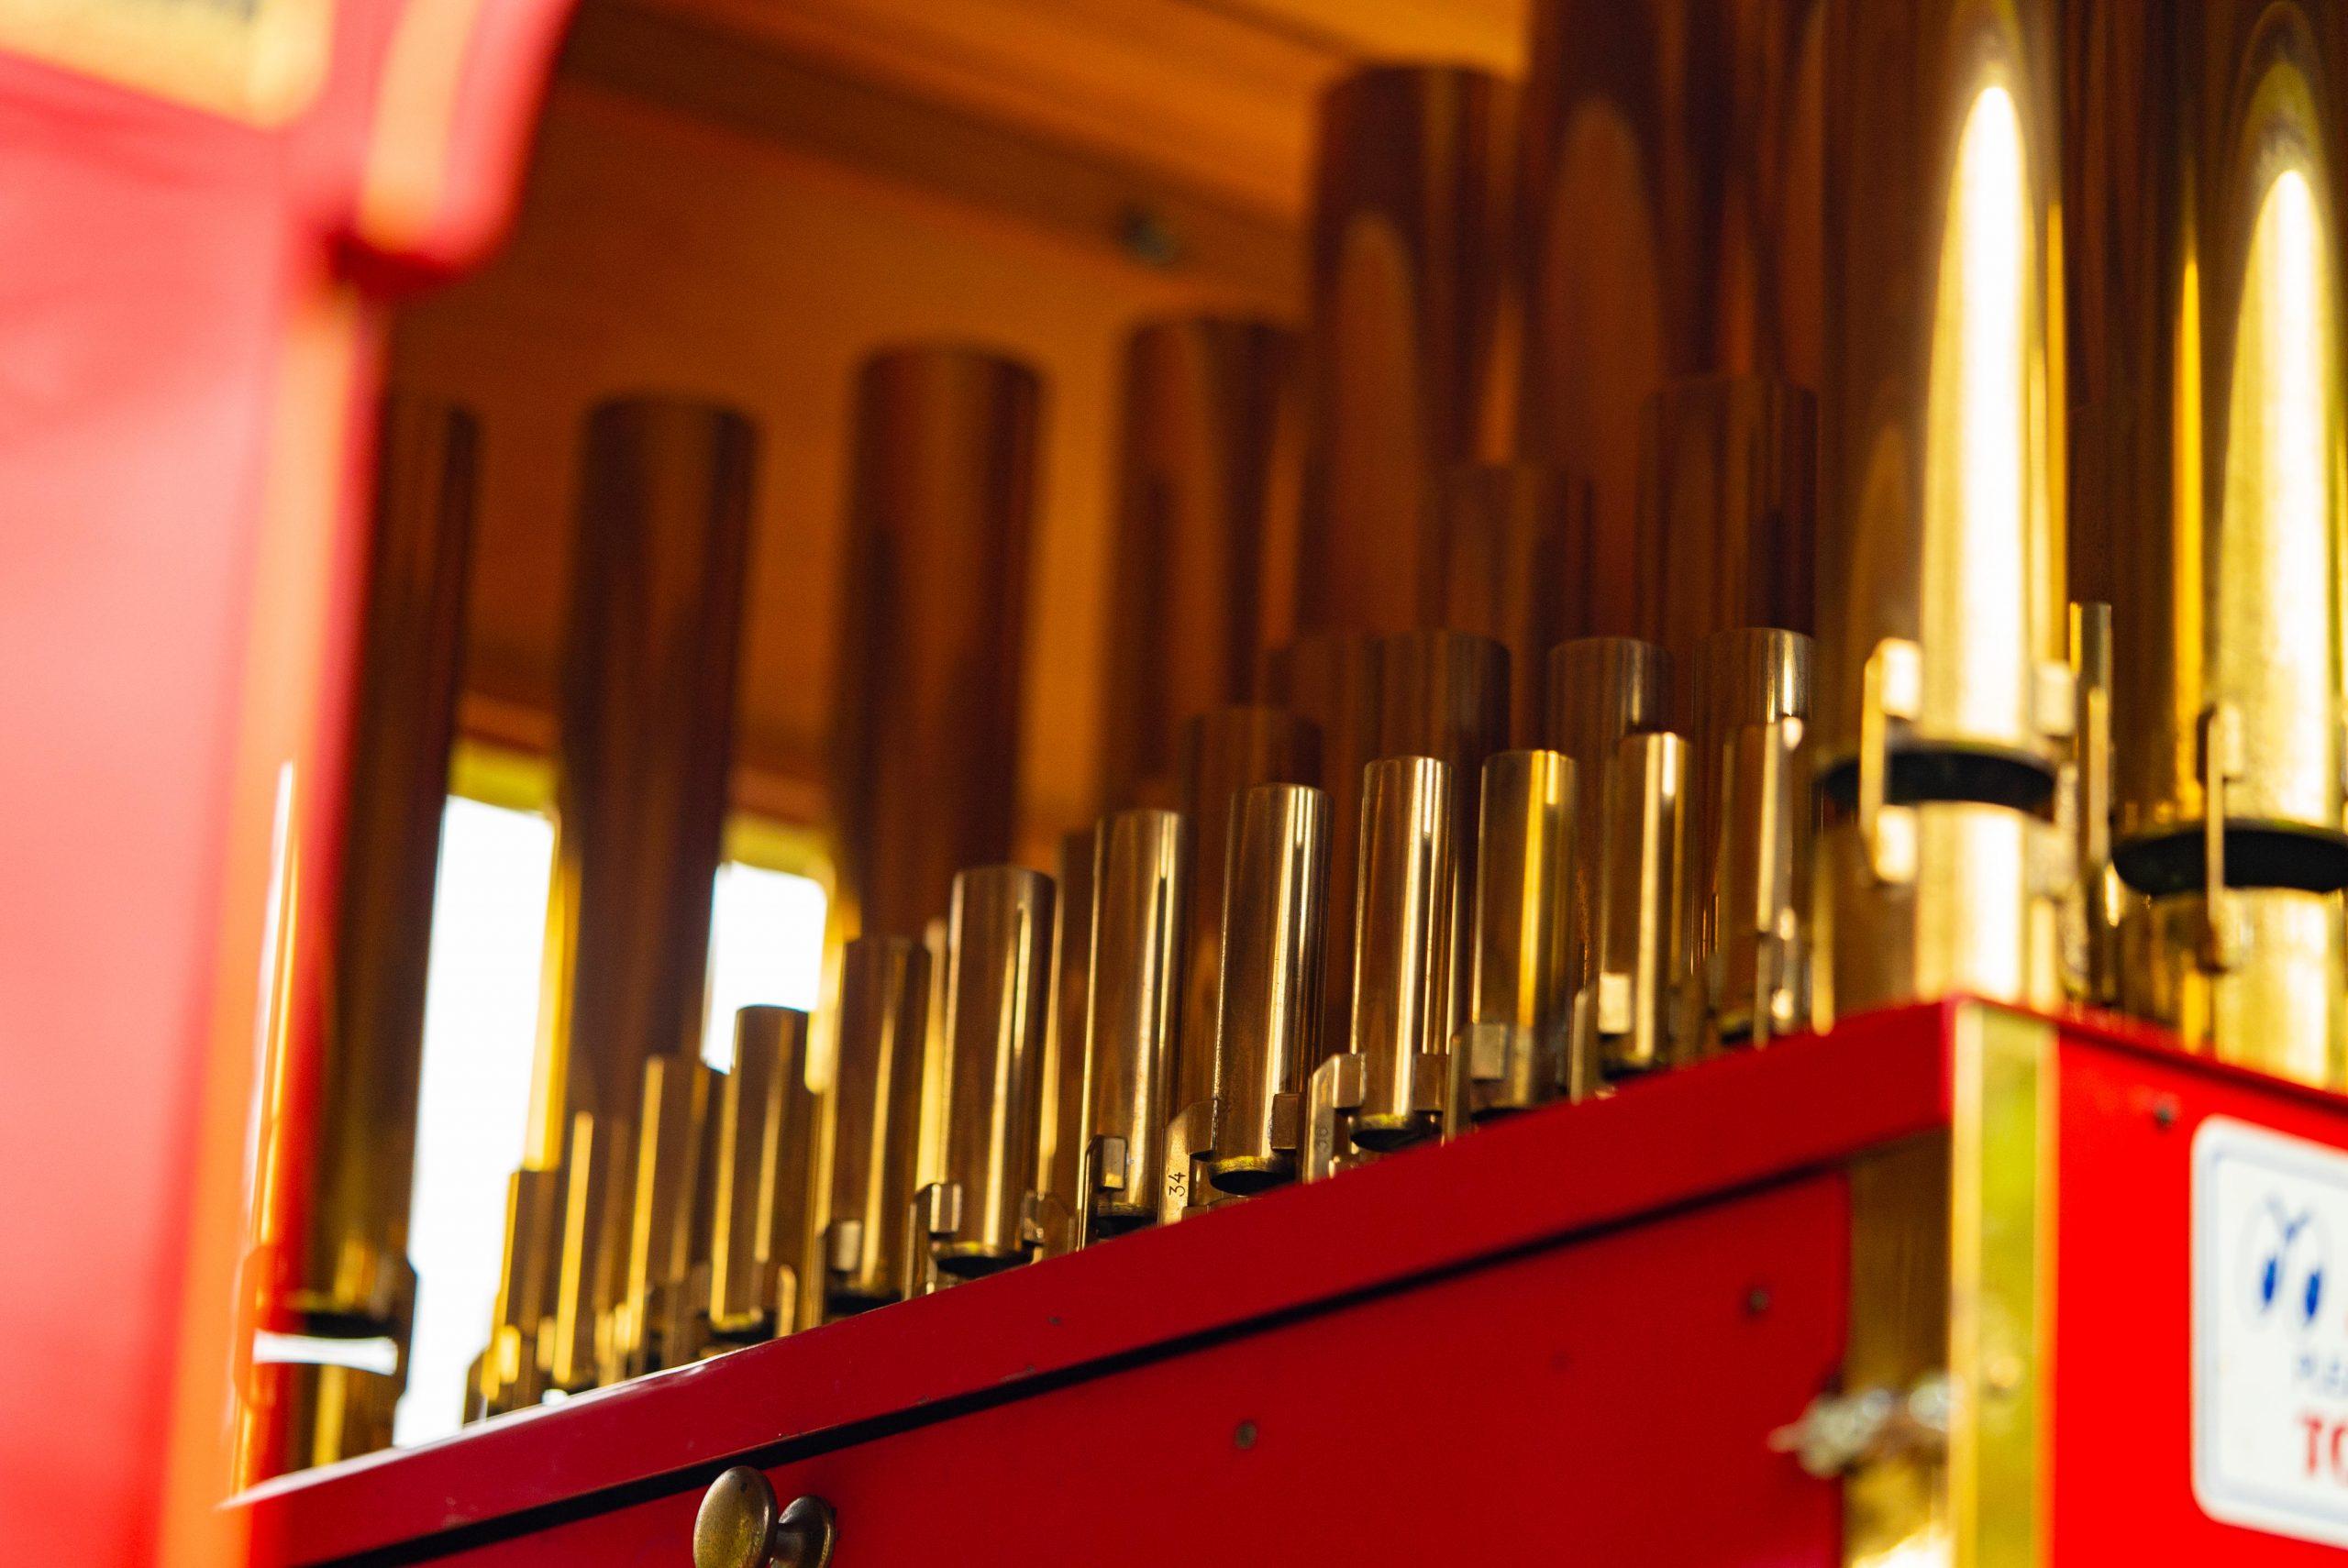 Ford Model T Organ Car pipes